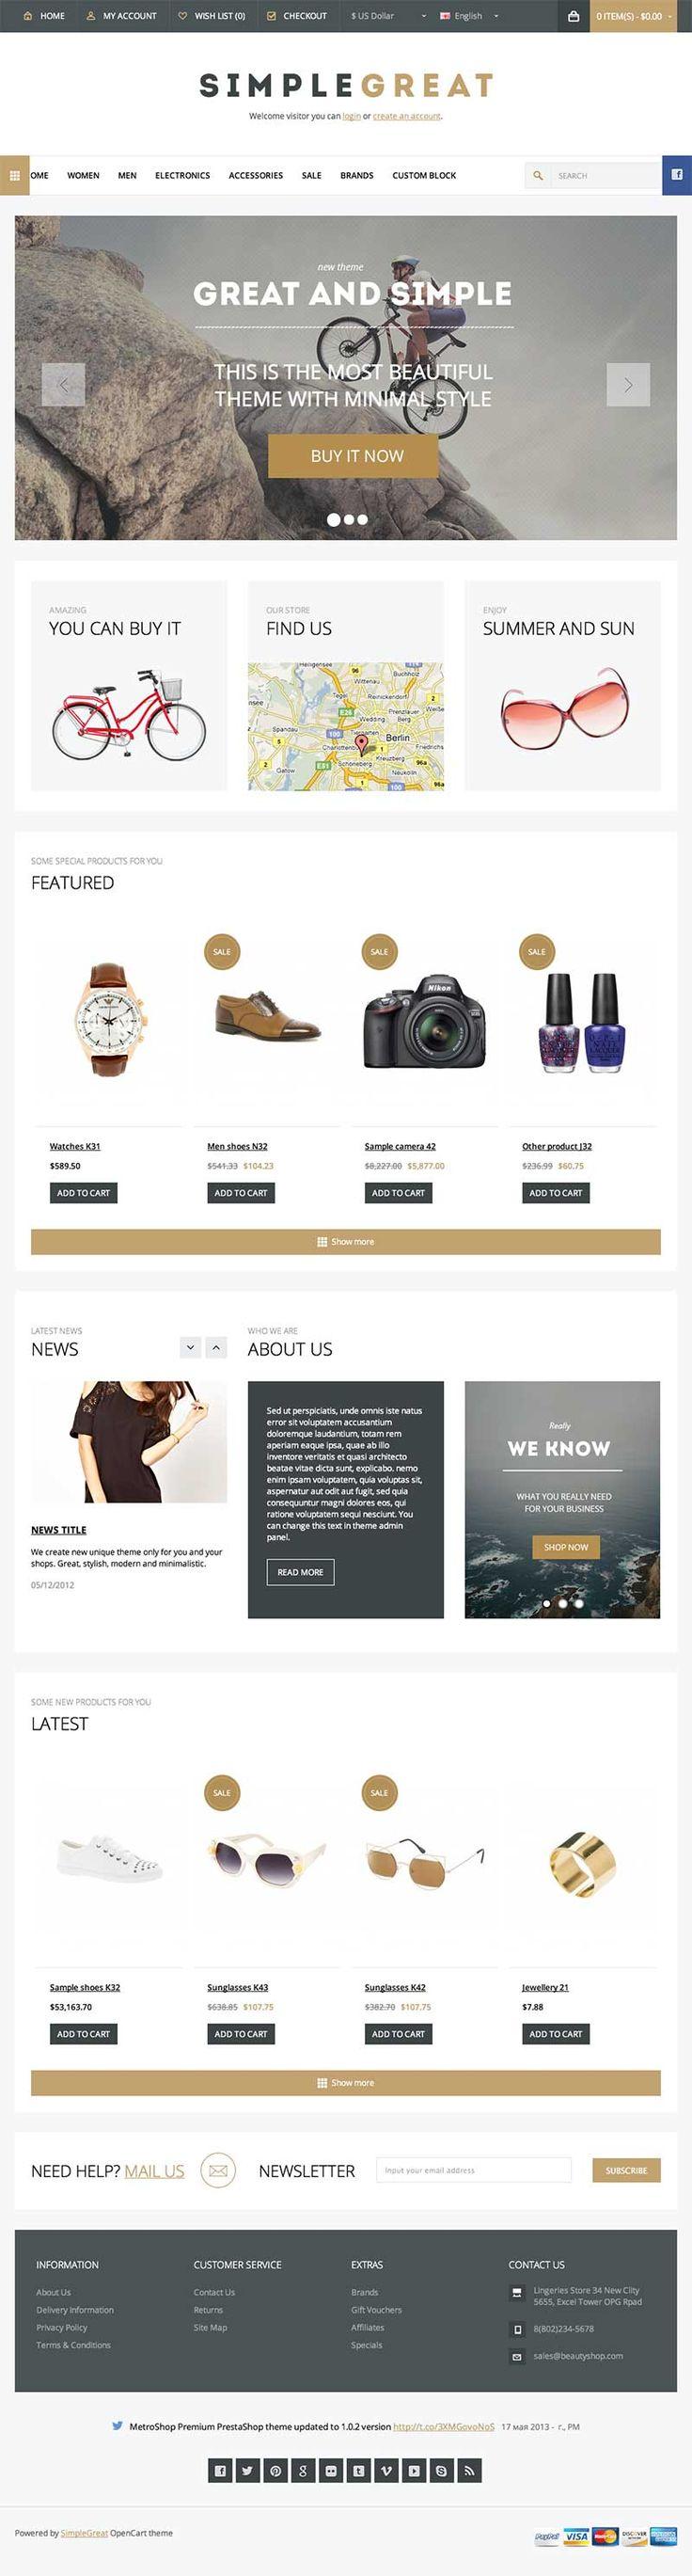 SimpleGreat - Responsive Electronics Store #Magento eCommerce Theme